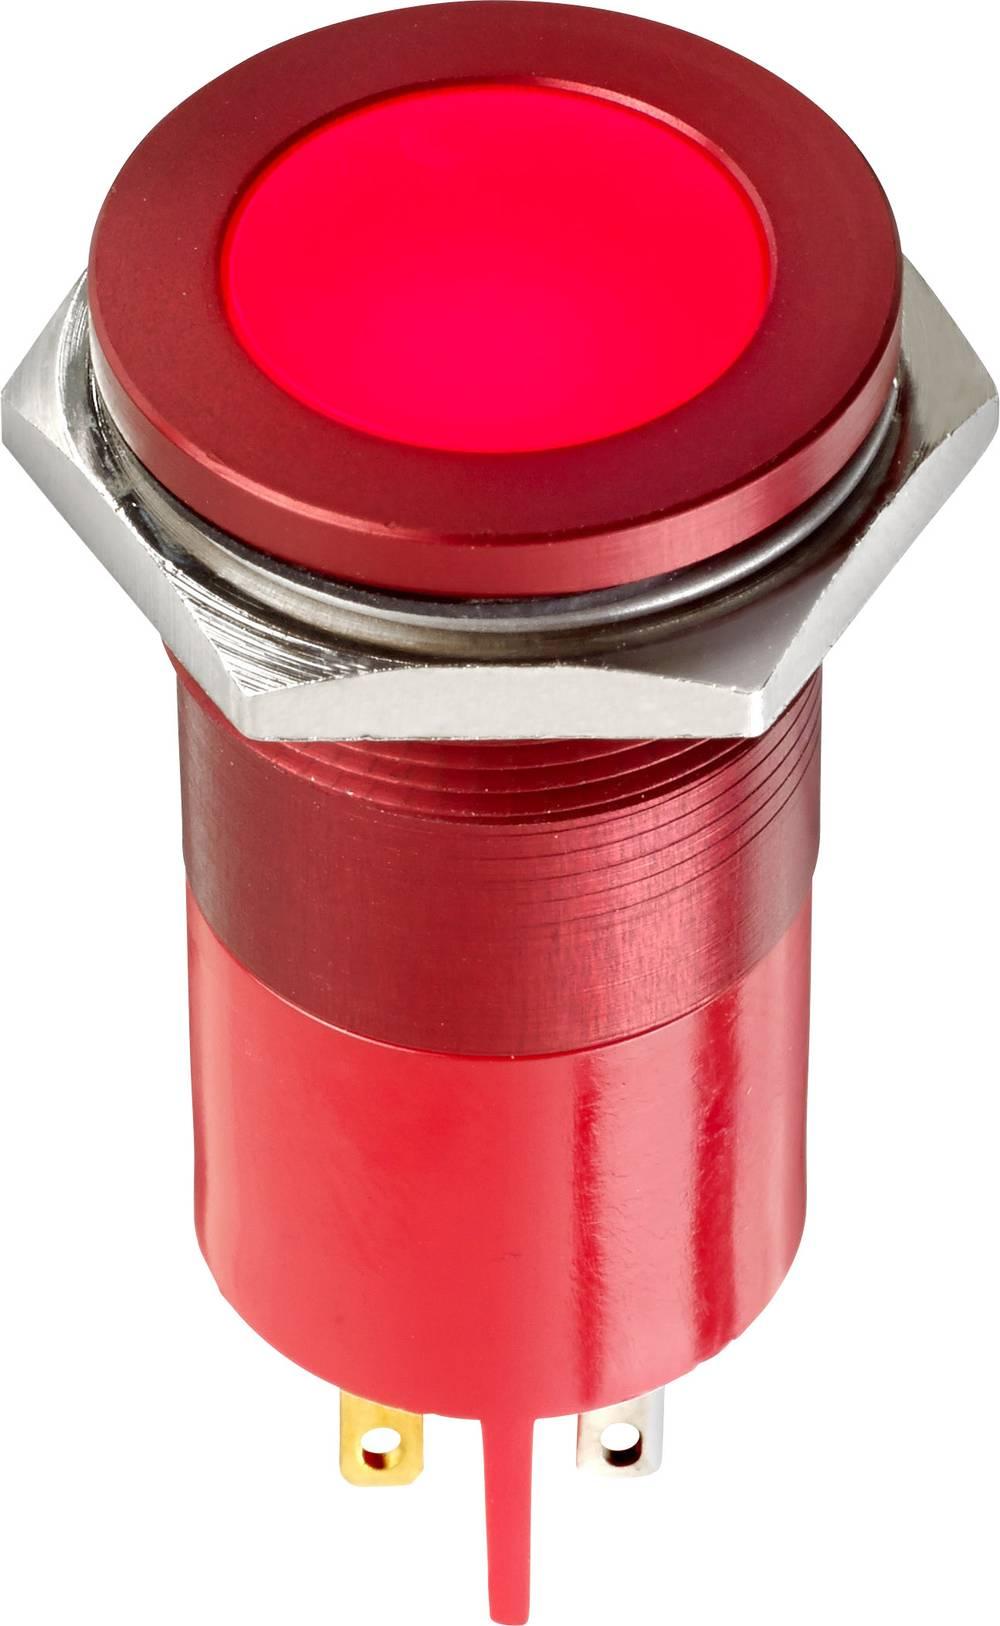 LED-signallampe APEM Q22F1ABXXB12AE 12 V/AC, 12 V/DC 40 mA Blå